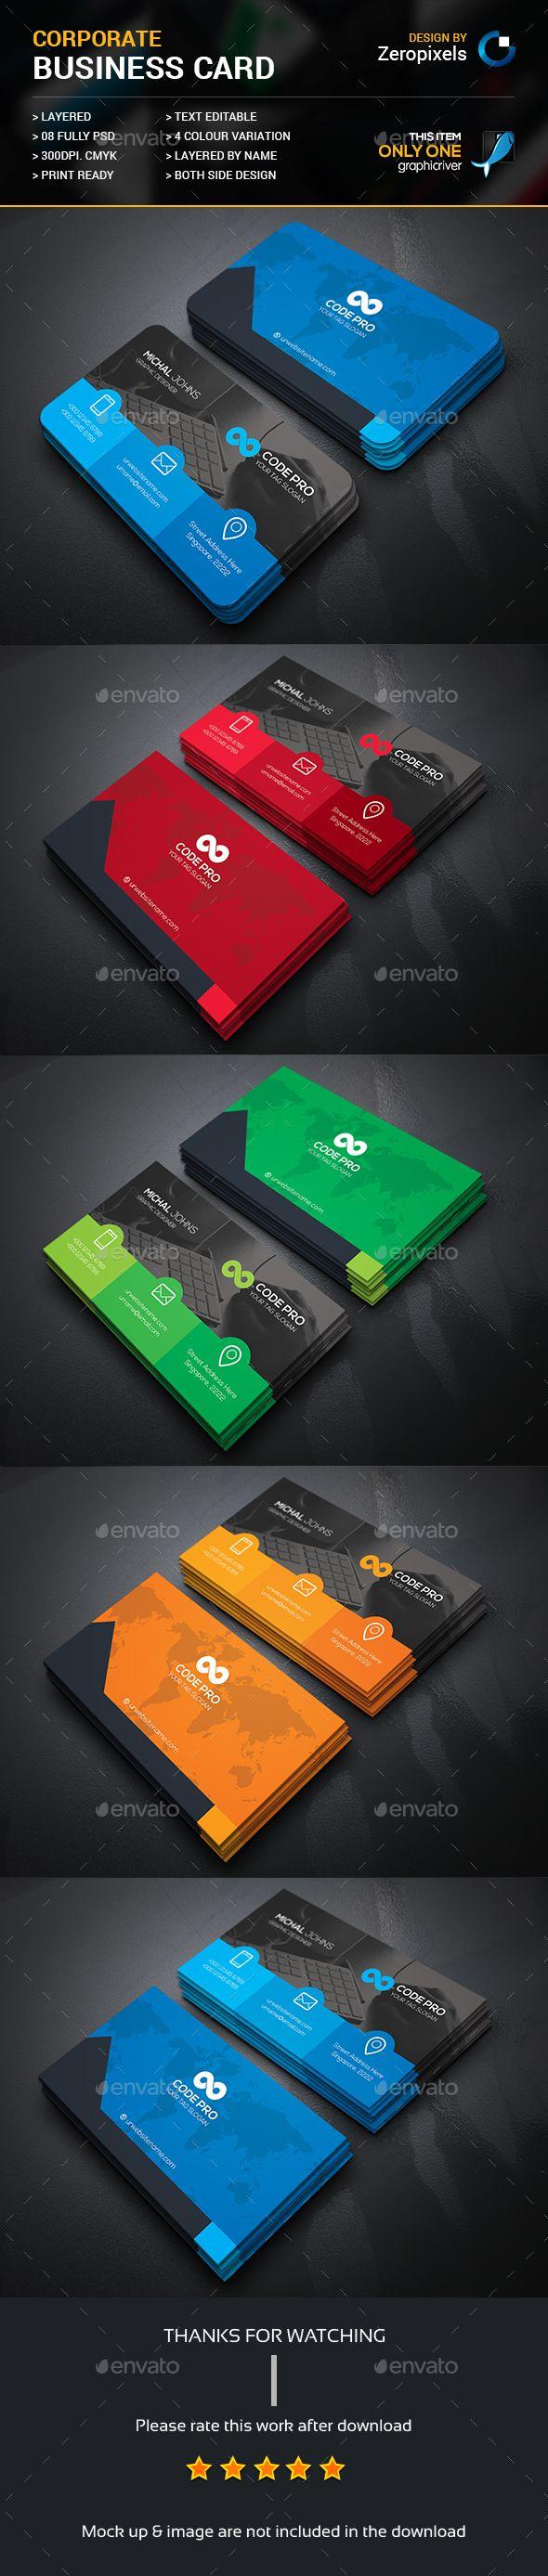 Modern Business Card Template PSD. Download here: http://graphicriver.net/item/modern-business-card/16214054?ref=ksioks